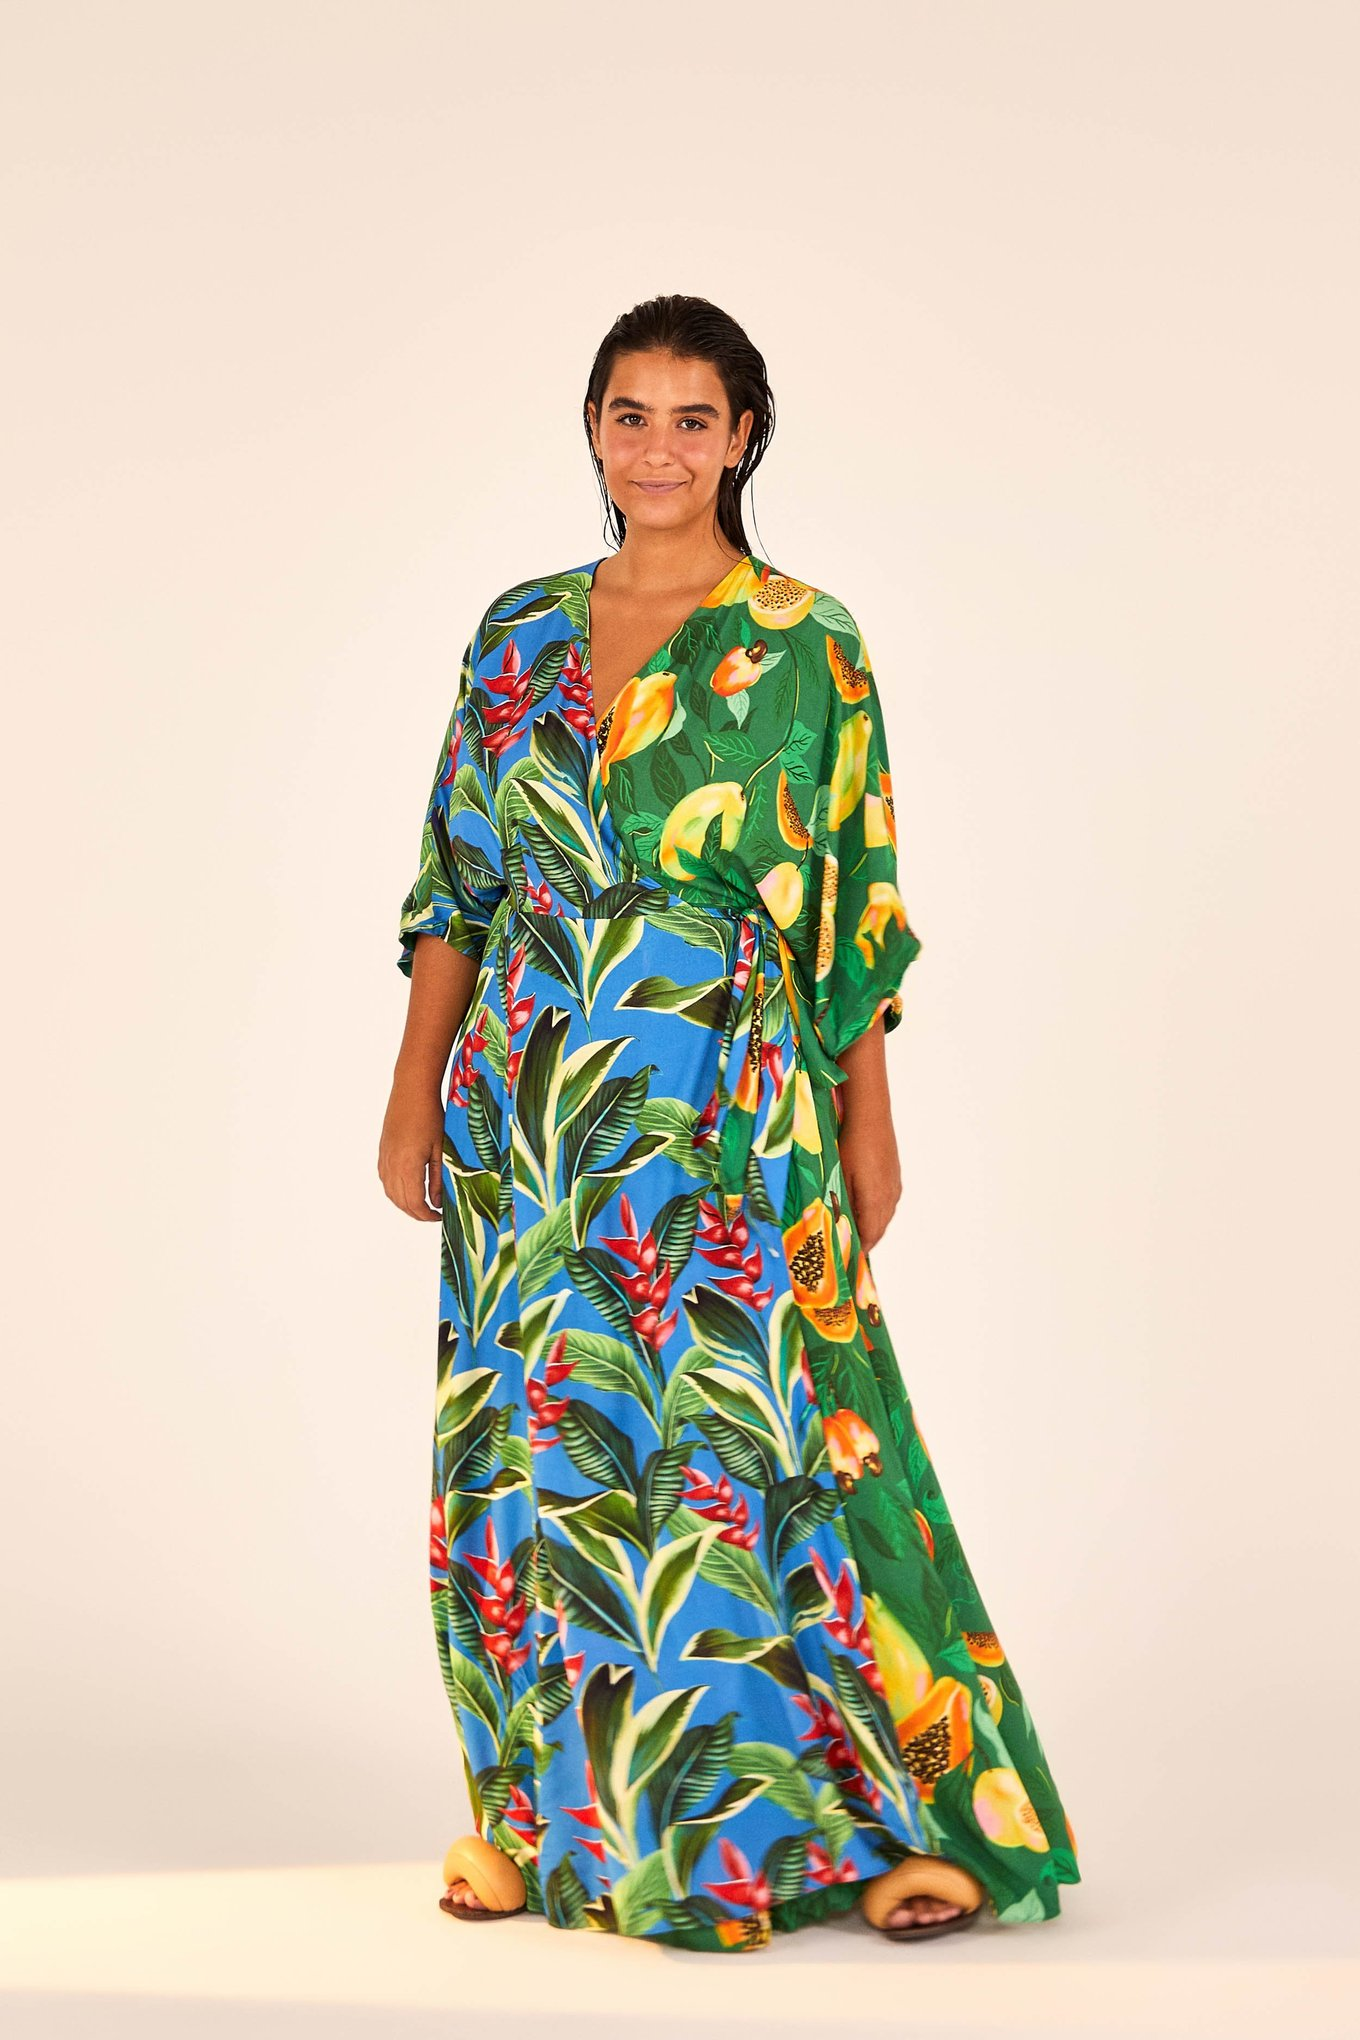 Dual Prints Papaya Dream Maxi Wrap Dress $225